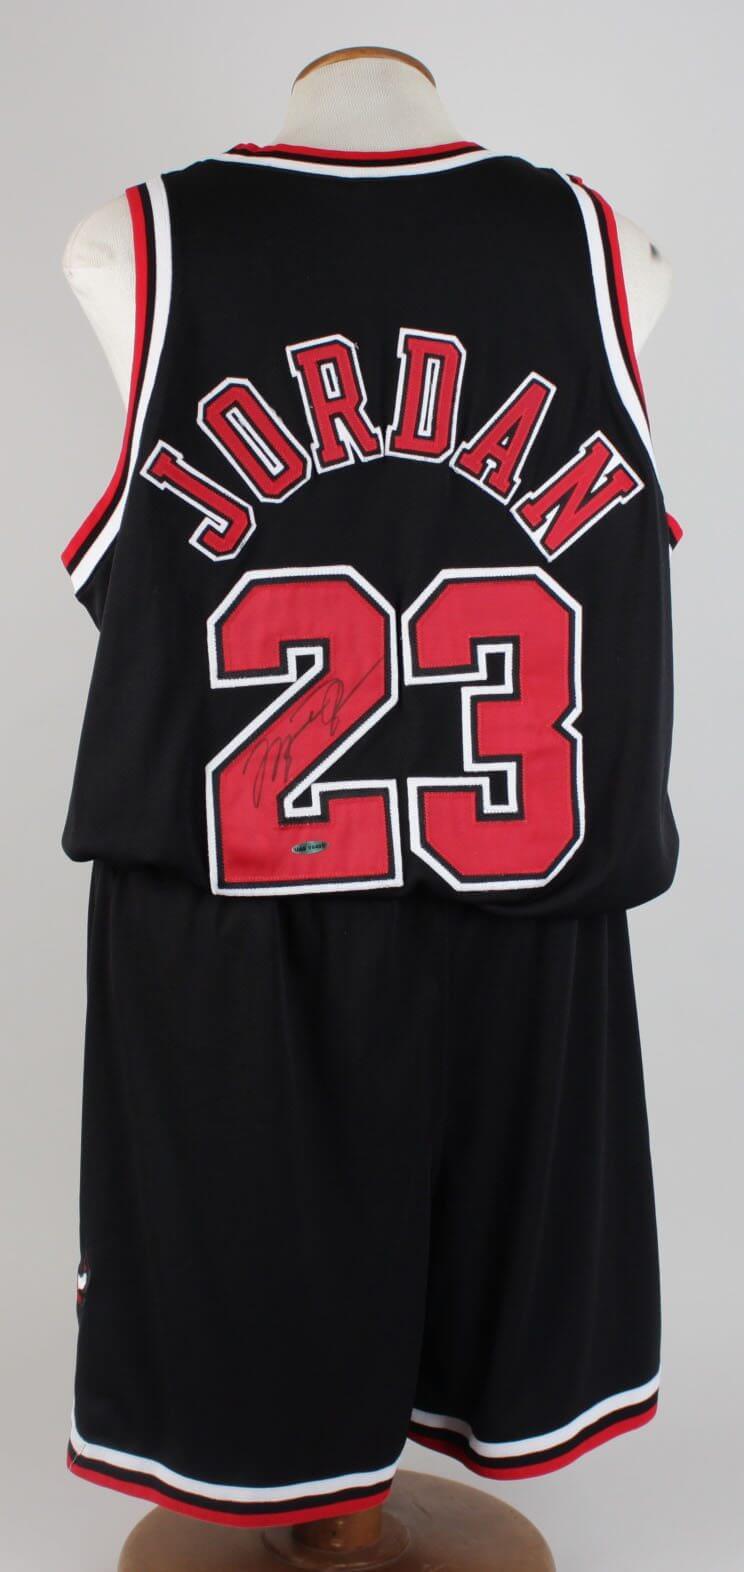 online retailer 29501 130d8 Michael Jordan Chicago Bulls Signed Alternate Uniform Incl. Auto Jersey &  Trunks (UDA COA)